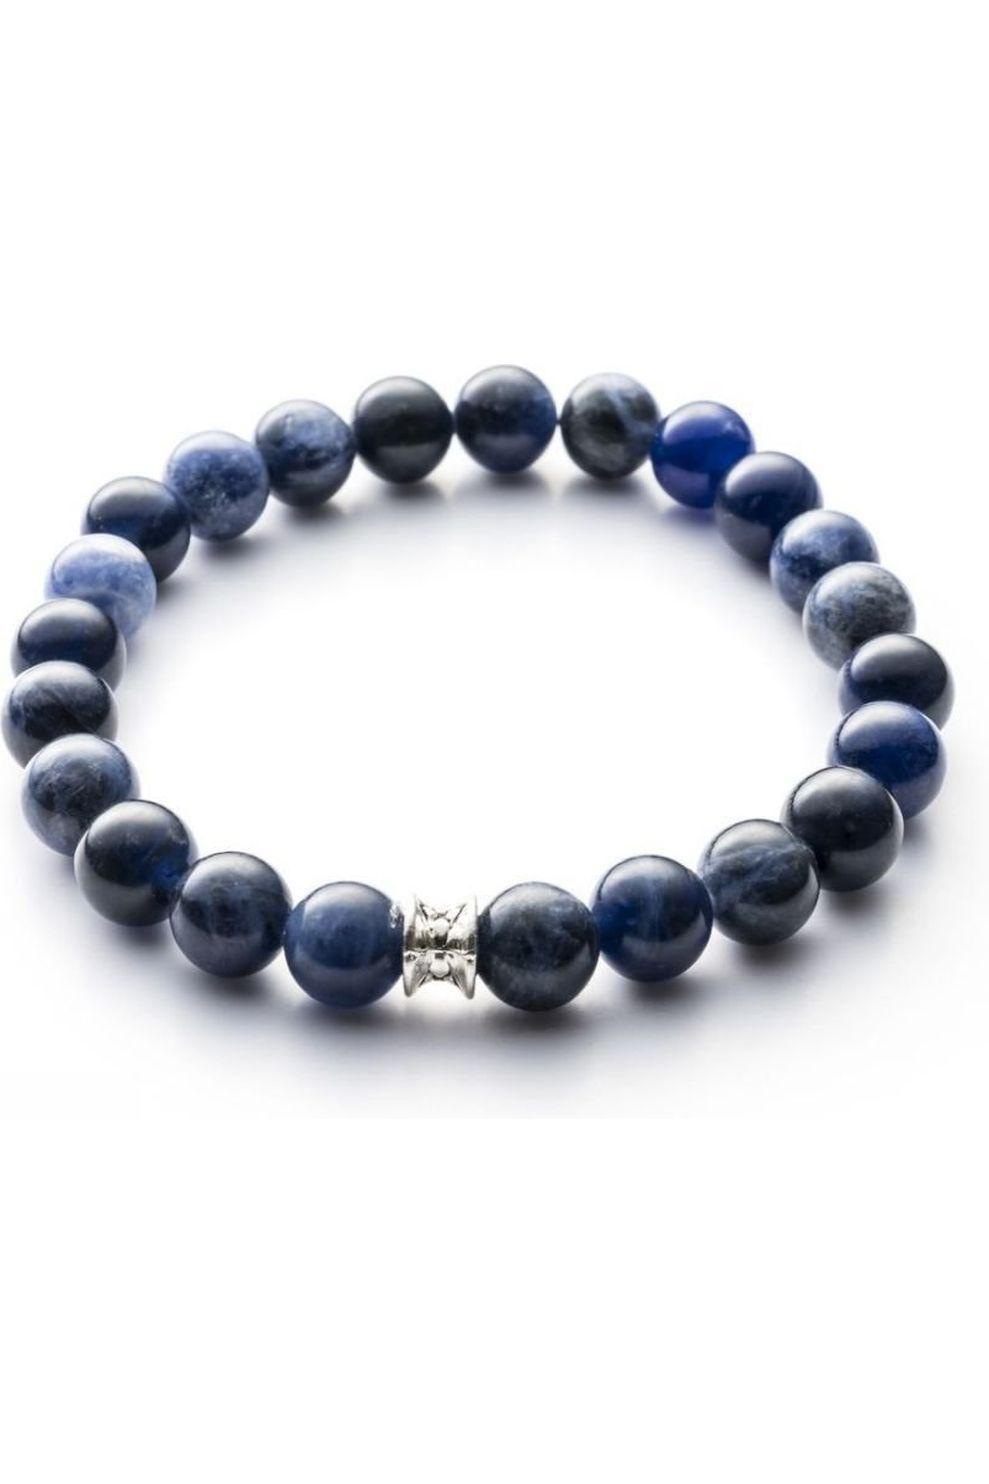 Gemini Armband B4 voor heren Blauw Maten: S, M